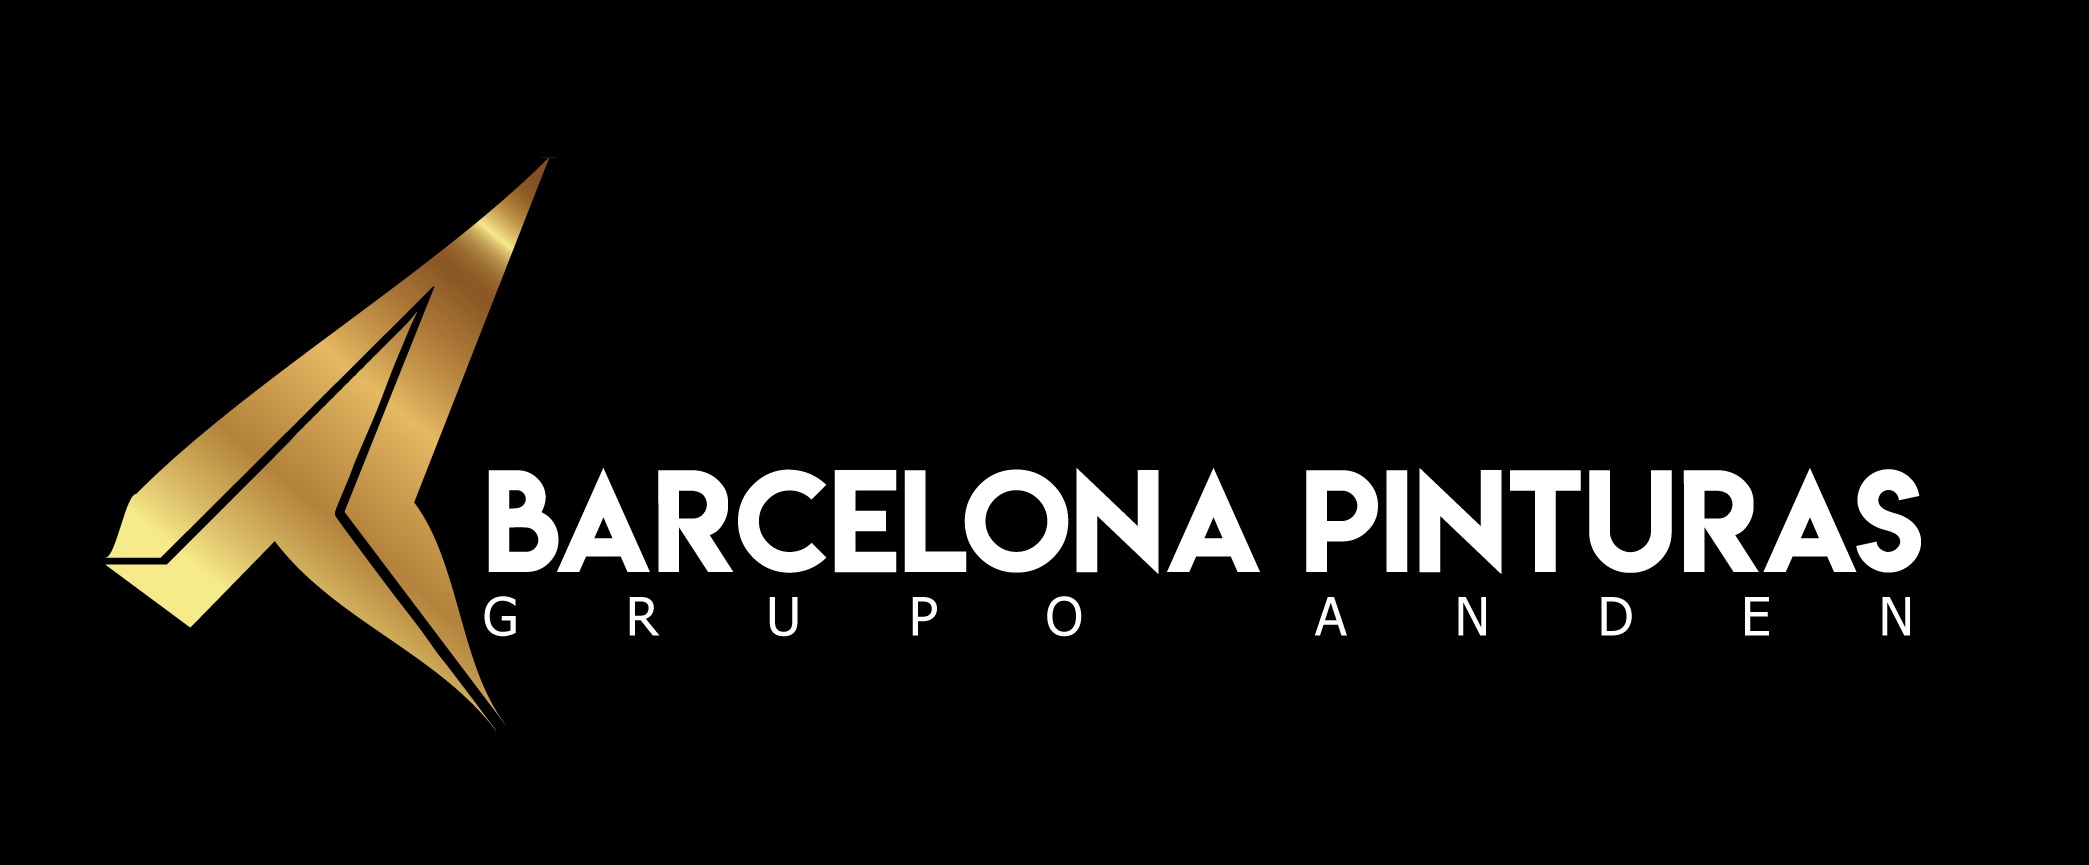 Barcelona Pinturas